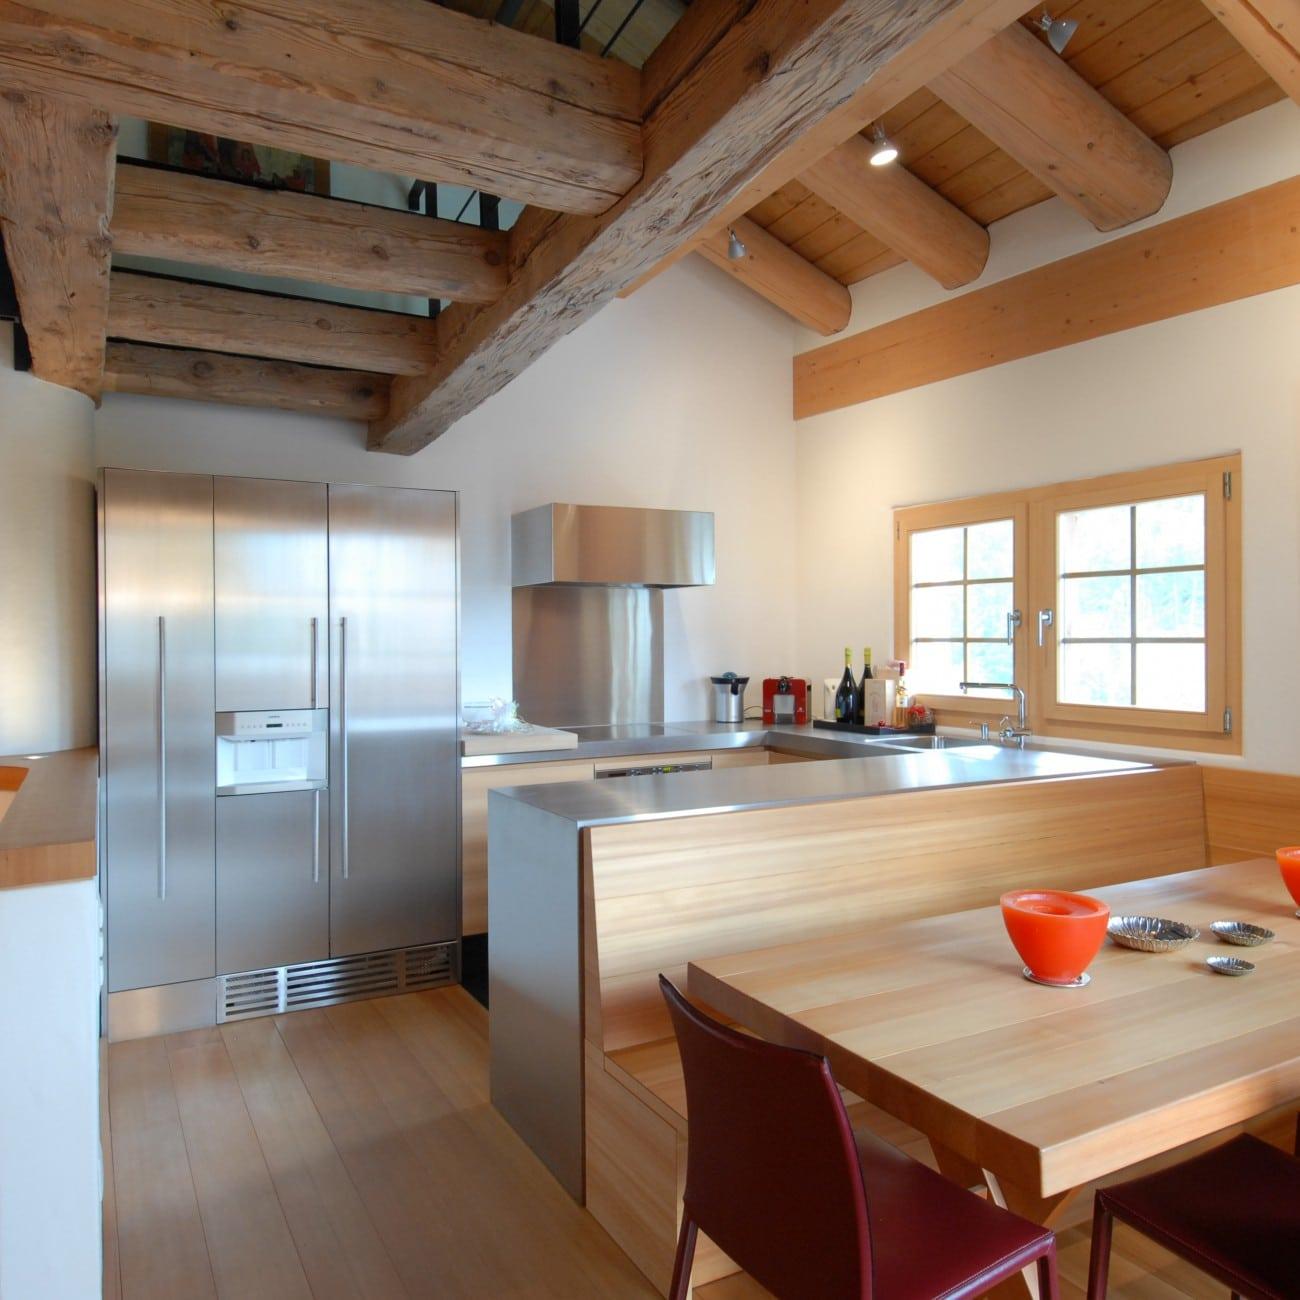 Fabulous Die perfekte Küche - Architektur Zehnder HK92